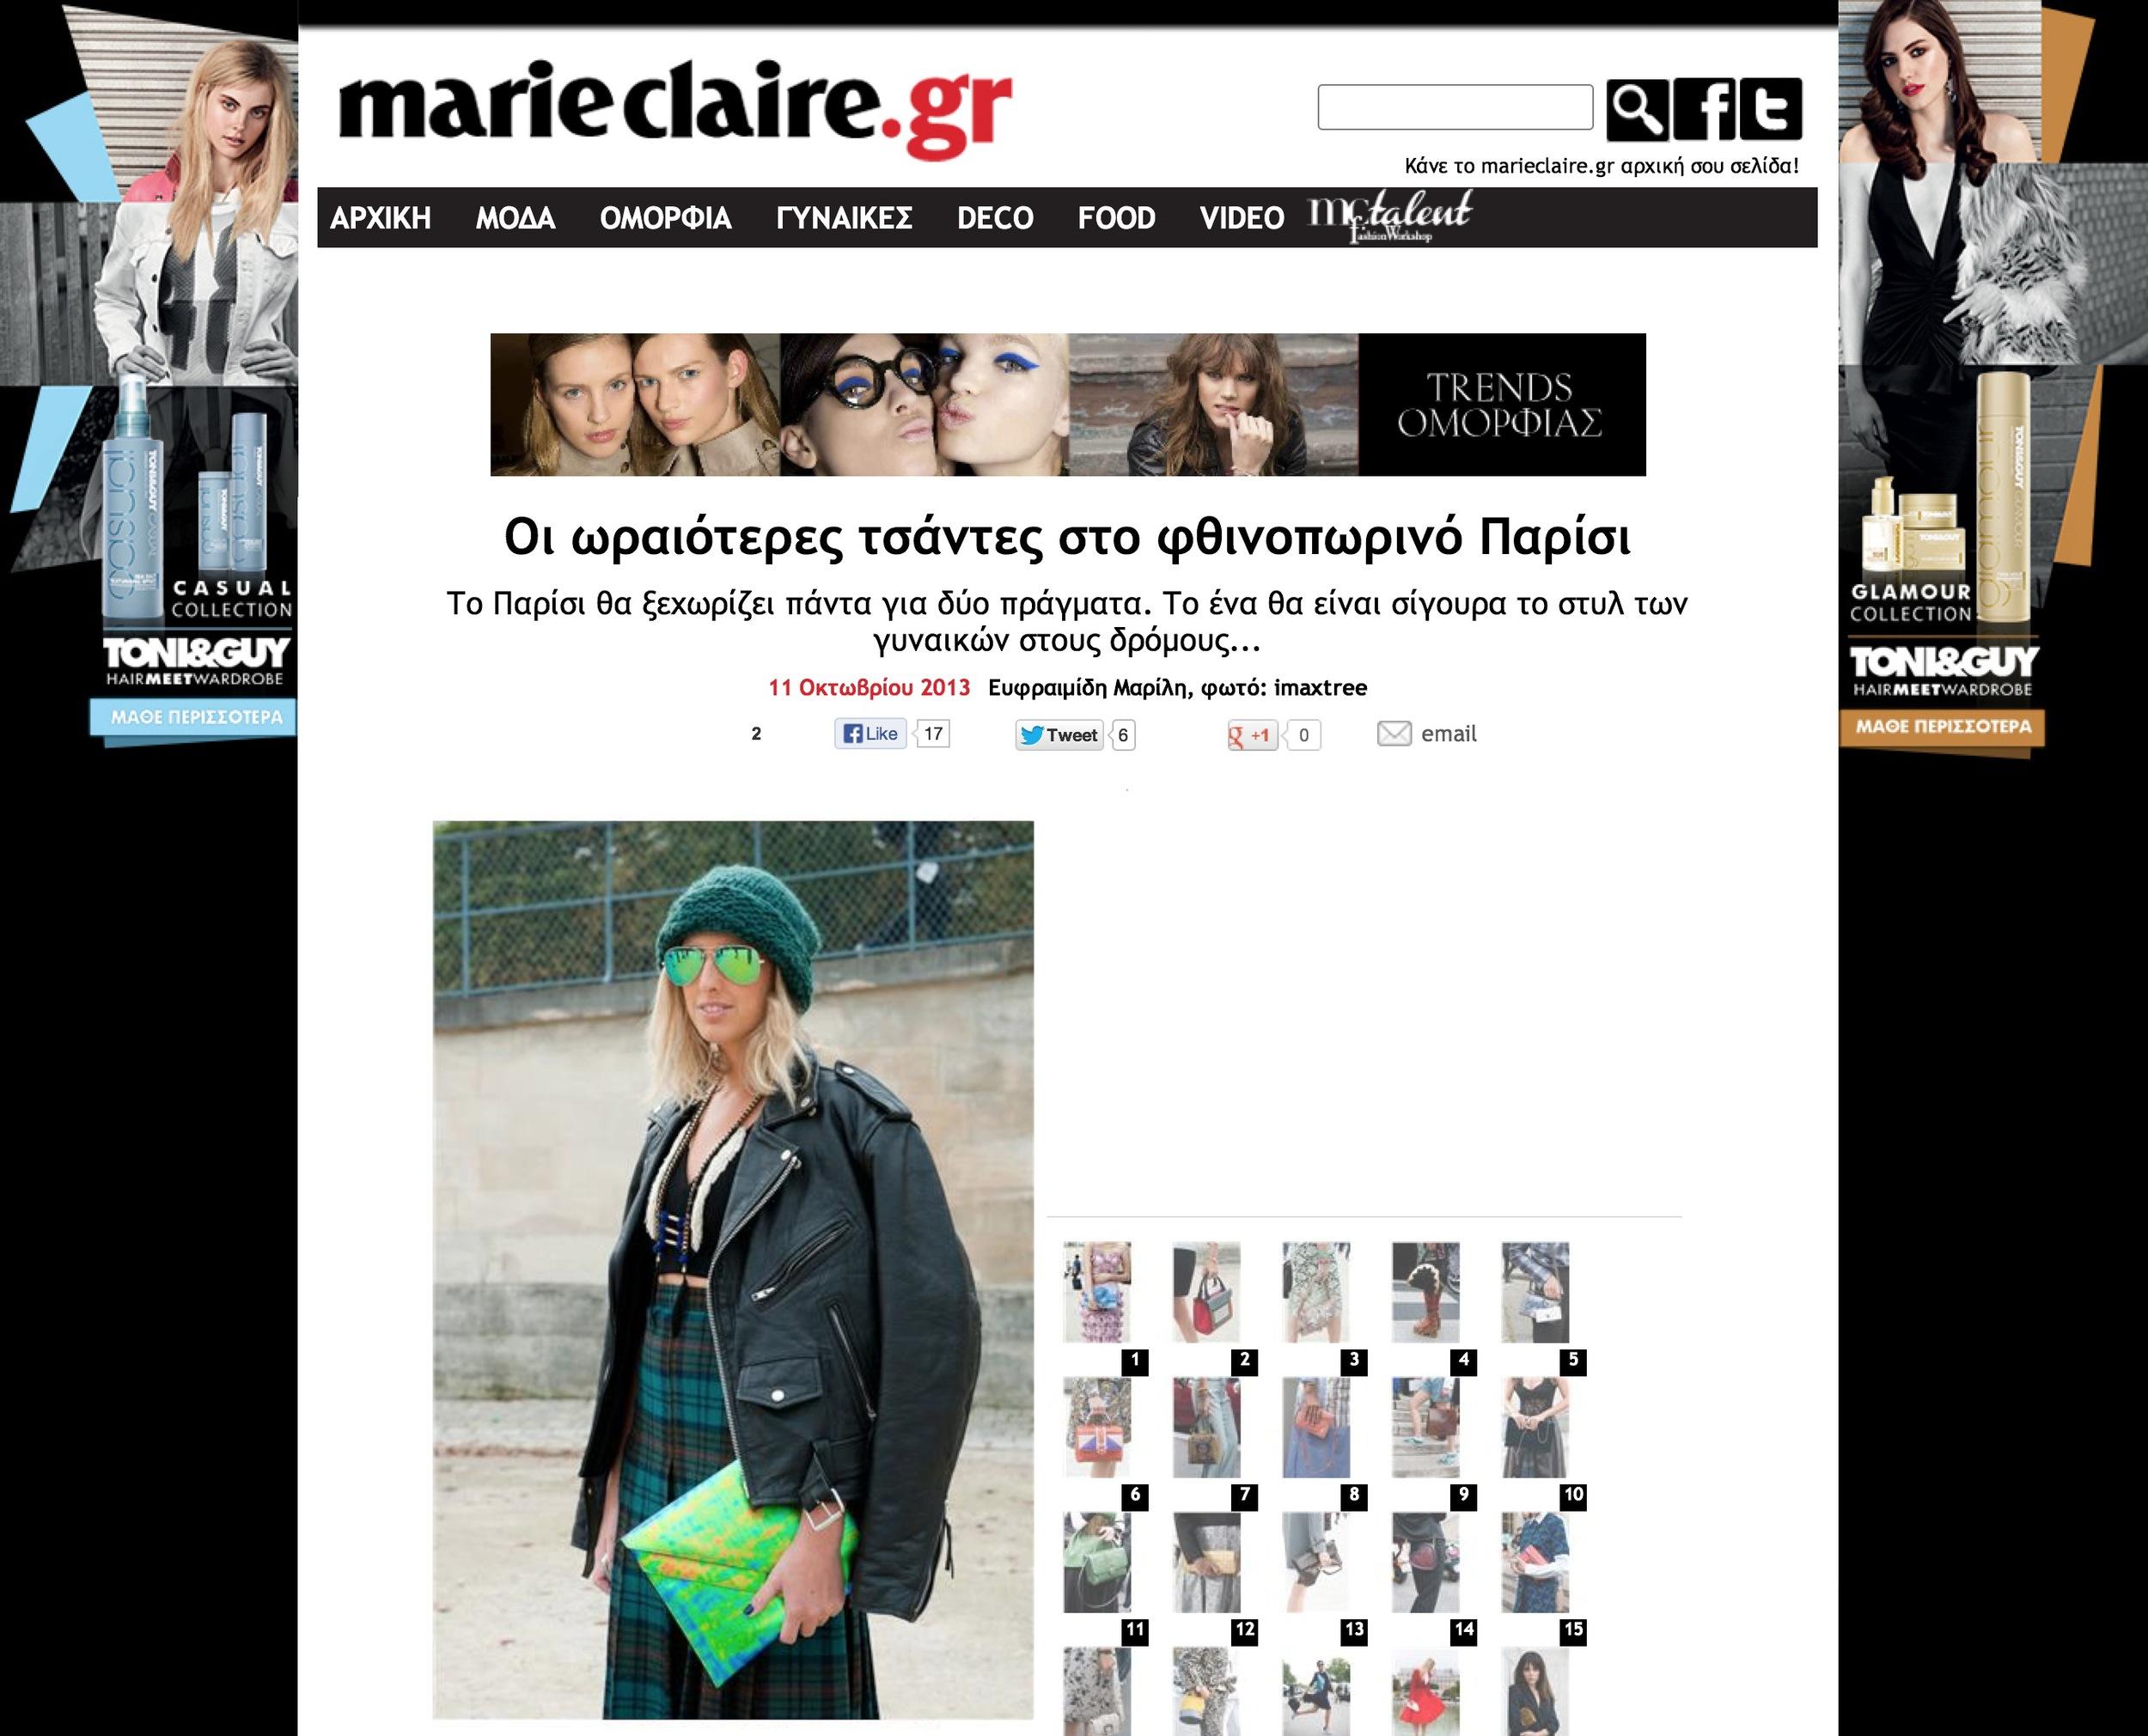 marie claire greece   Paris fashion week   September 2013